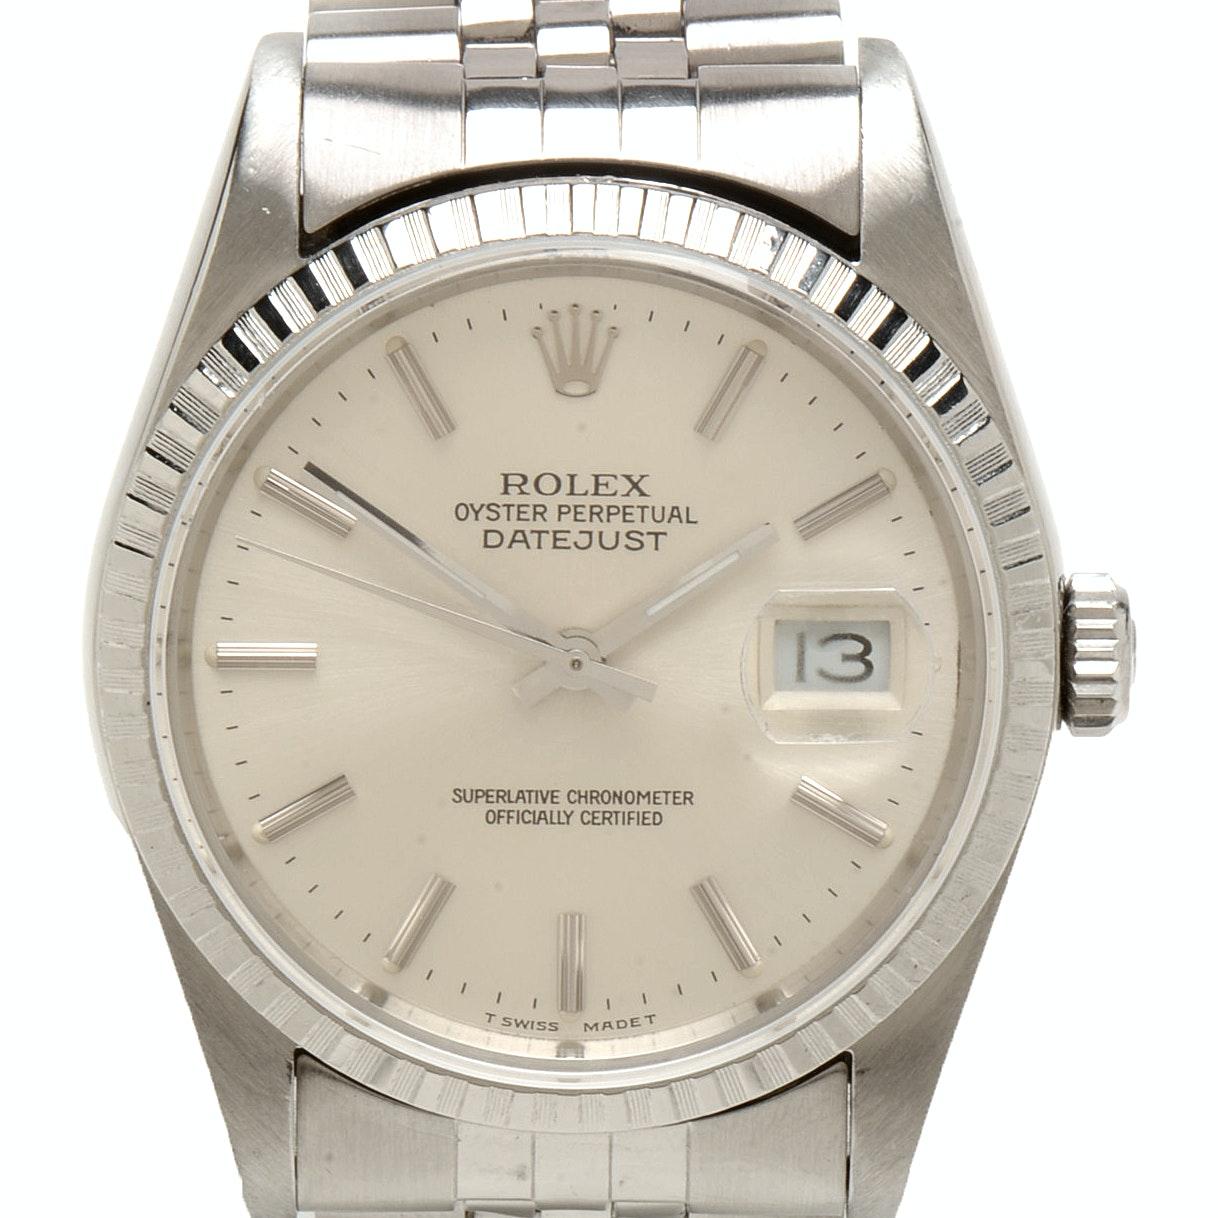 Rolex Datejust 16220 Automatic 36mm Silver Index Jubilee Steel Wristwatch